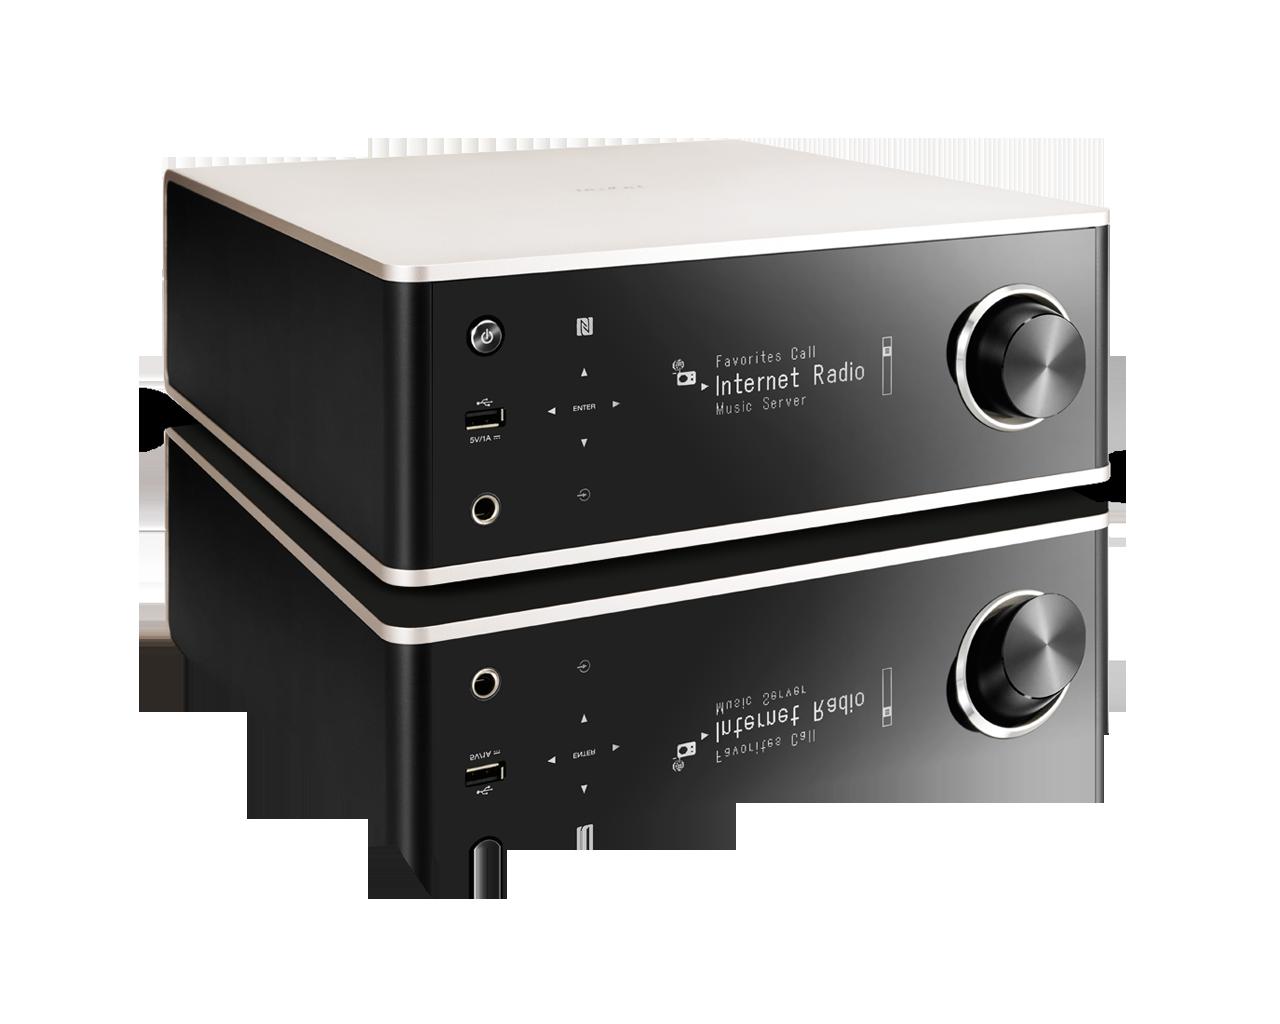 denon dra 100 netzwerk stereo receiver denon media. Black Bedroom Furniture Sets. Home Design Ideas